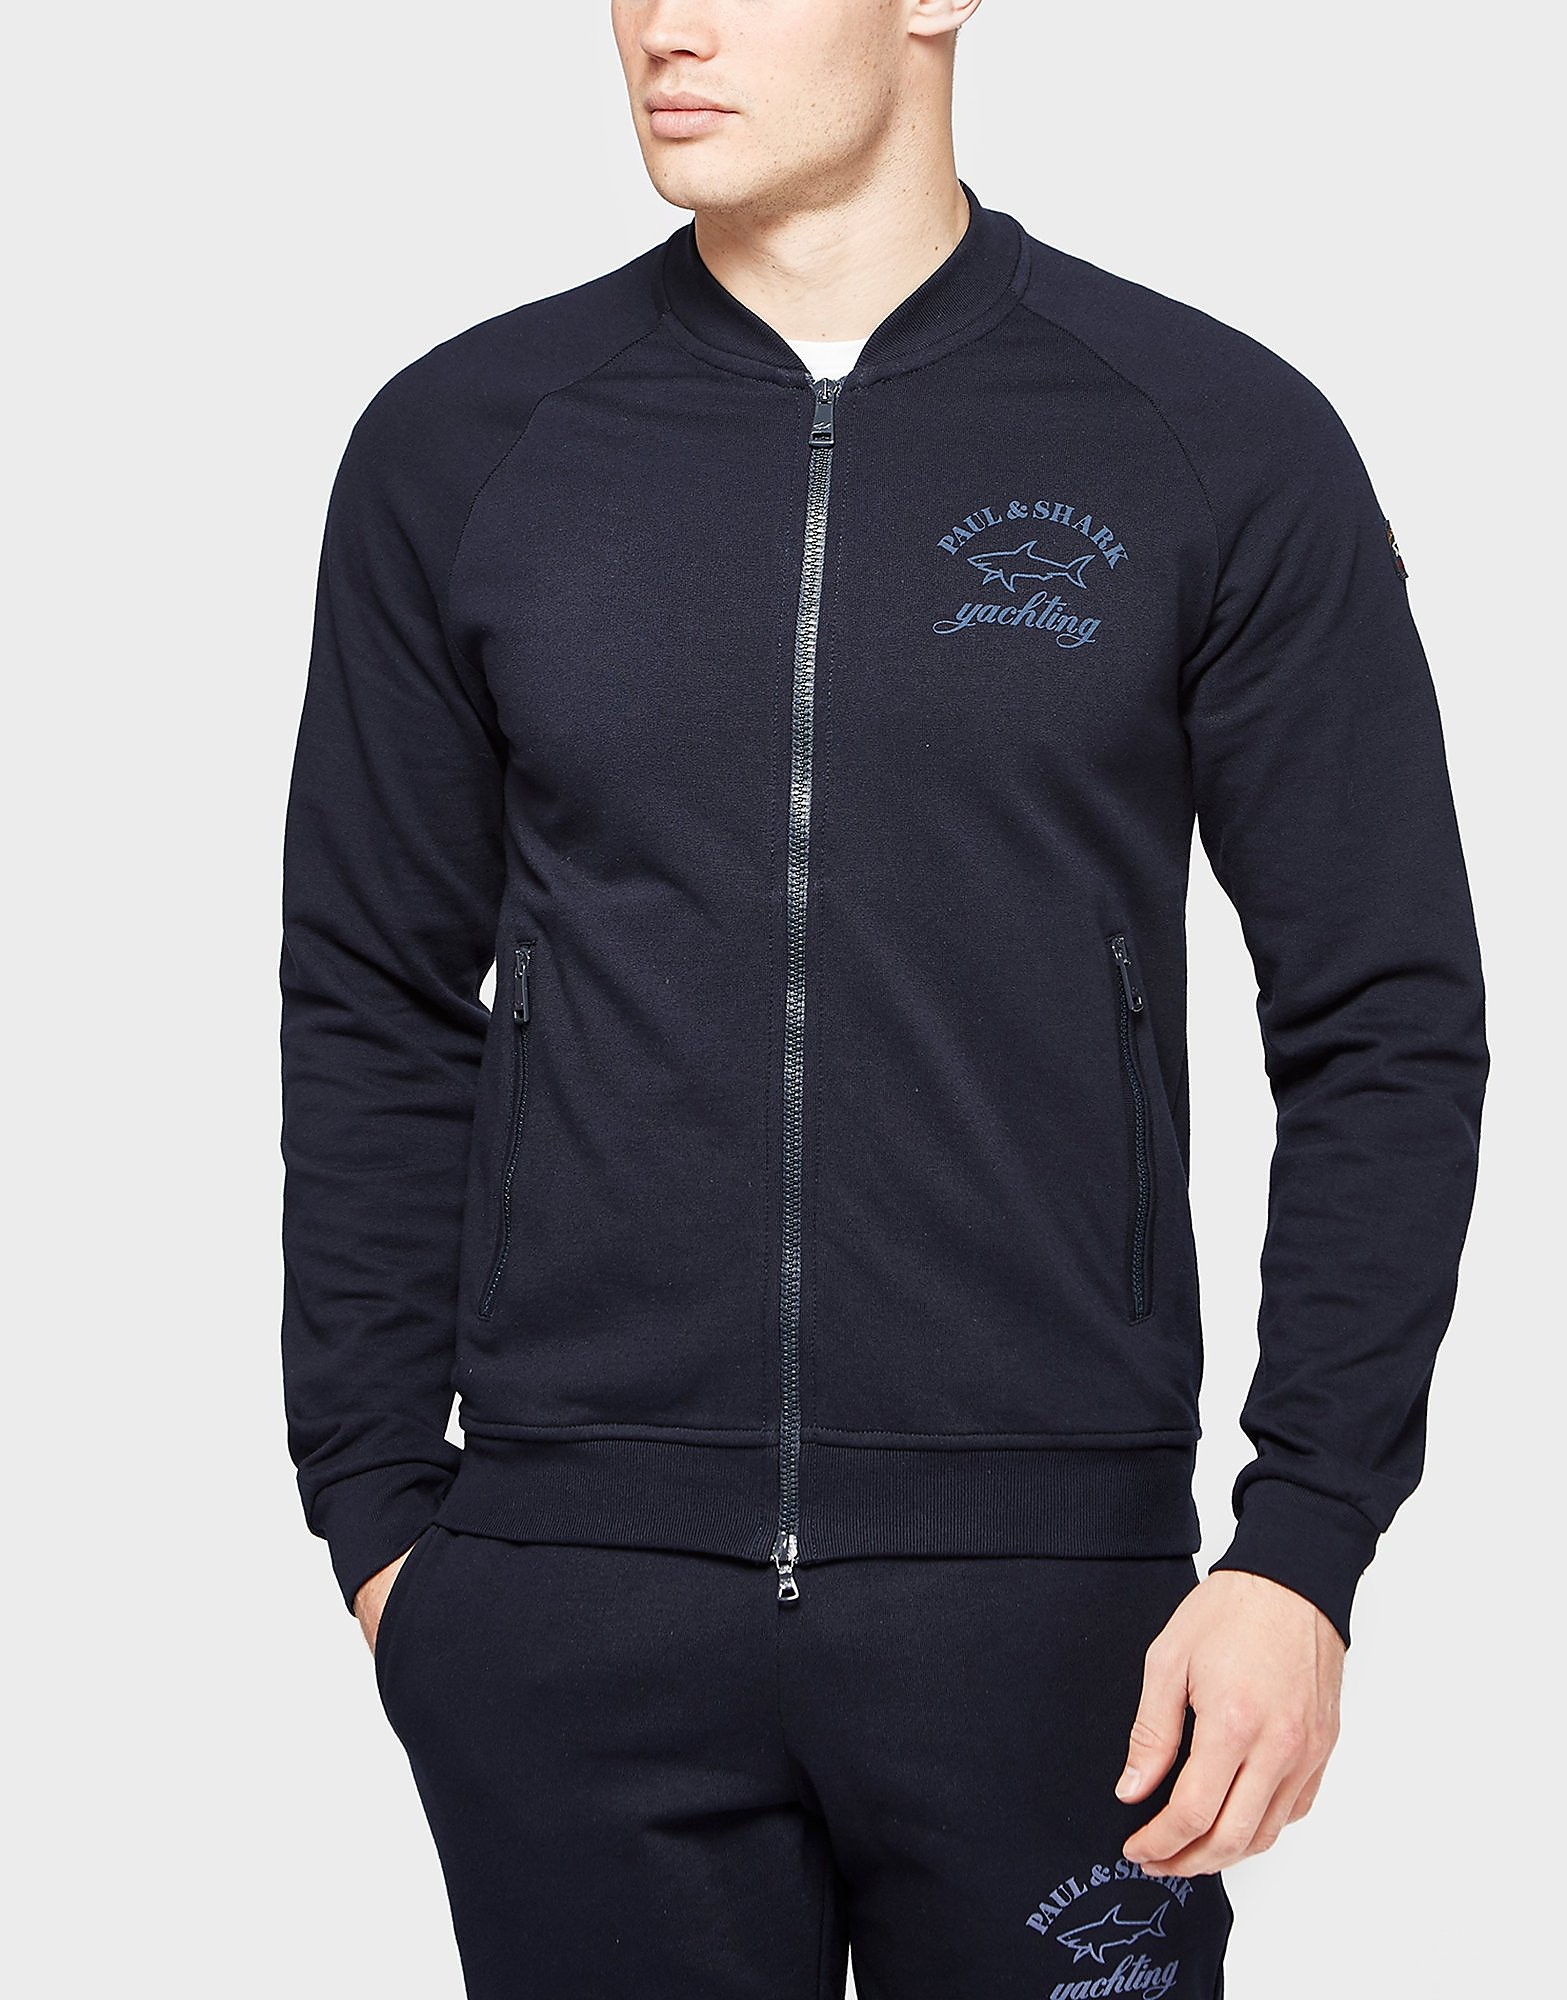 Paul and Shark Fleece Bomber Jacket - Exclusive